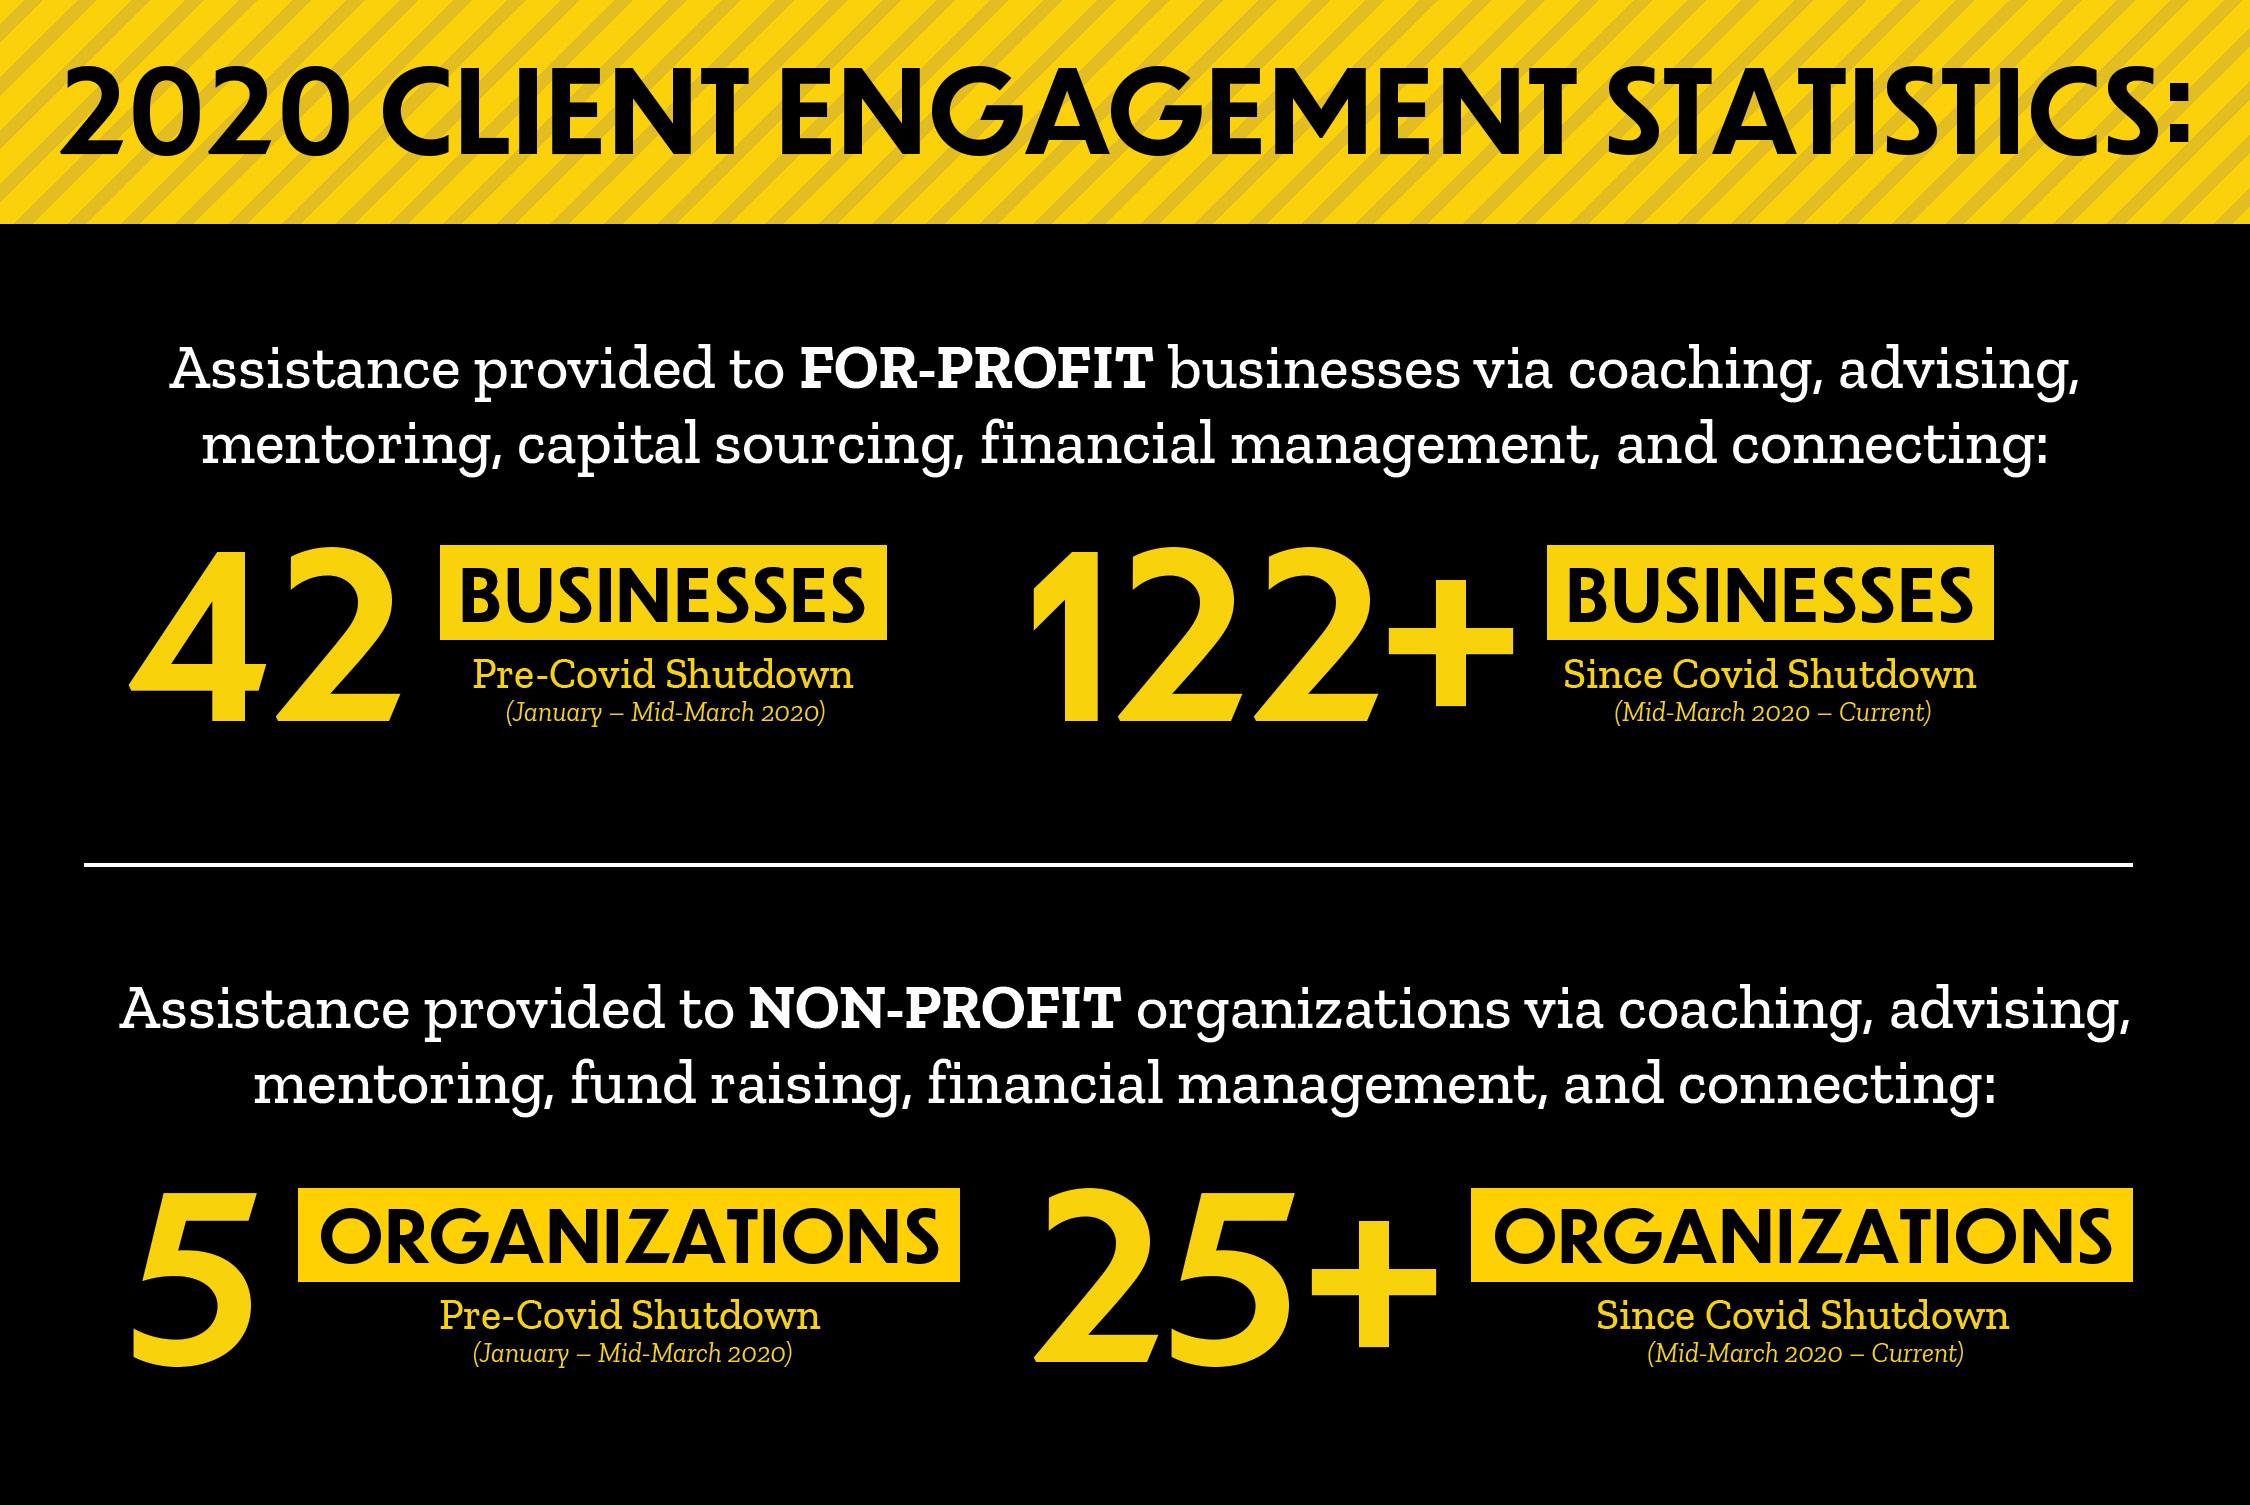 2020 Client Engagement Statistics